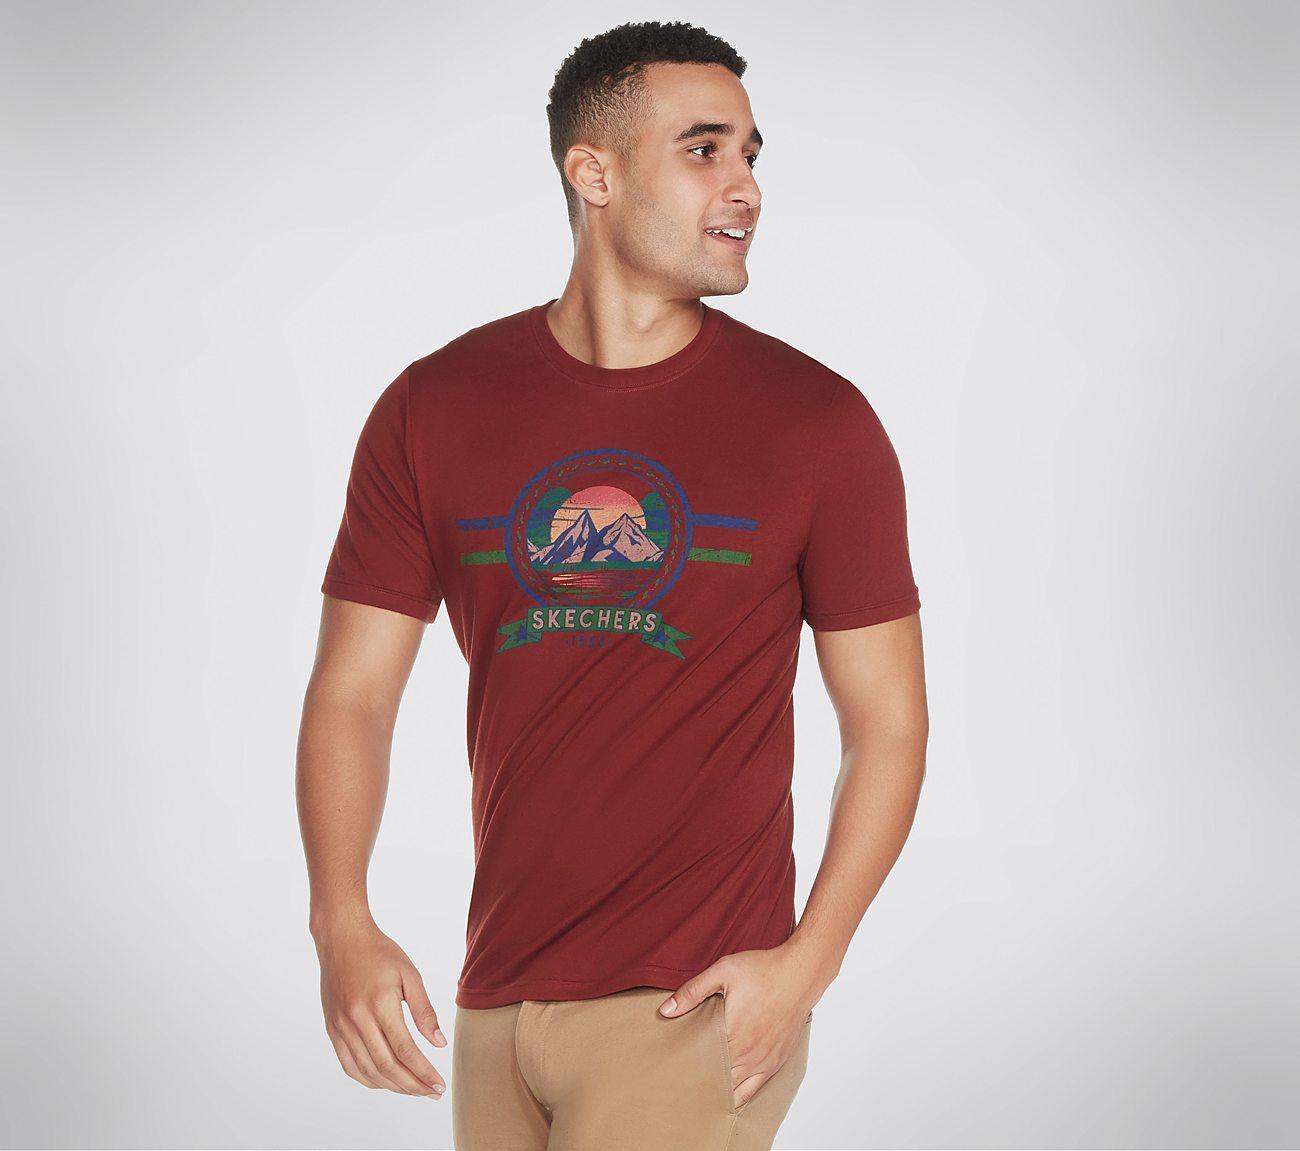 Skechers Apparel Mountain Tee Shirt